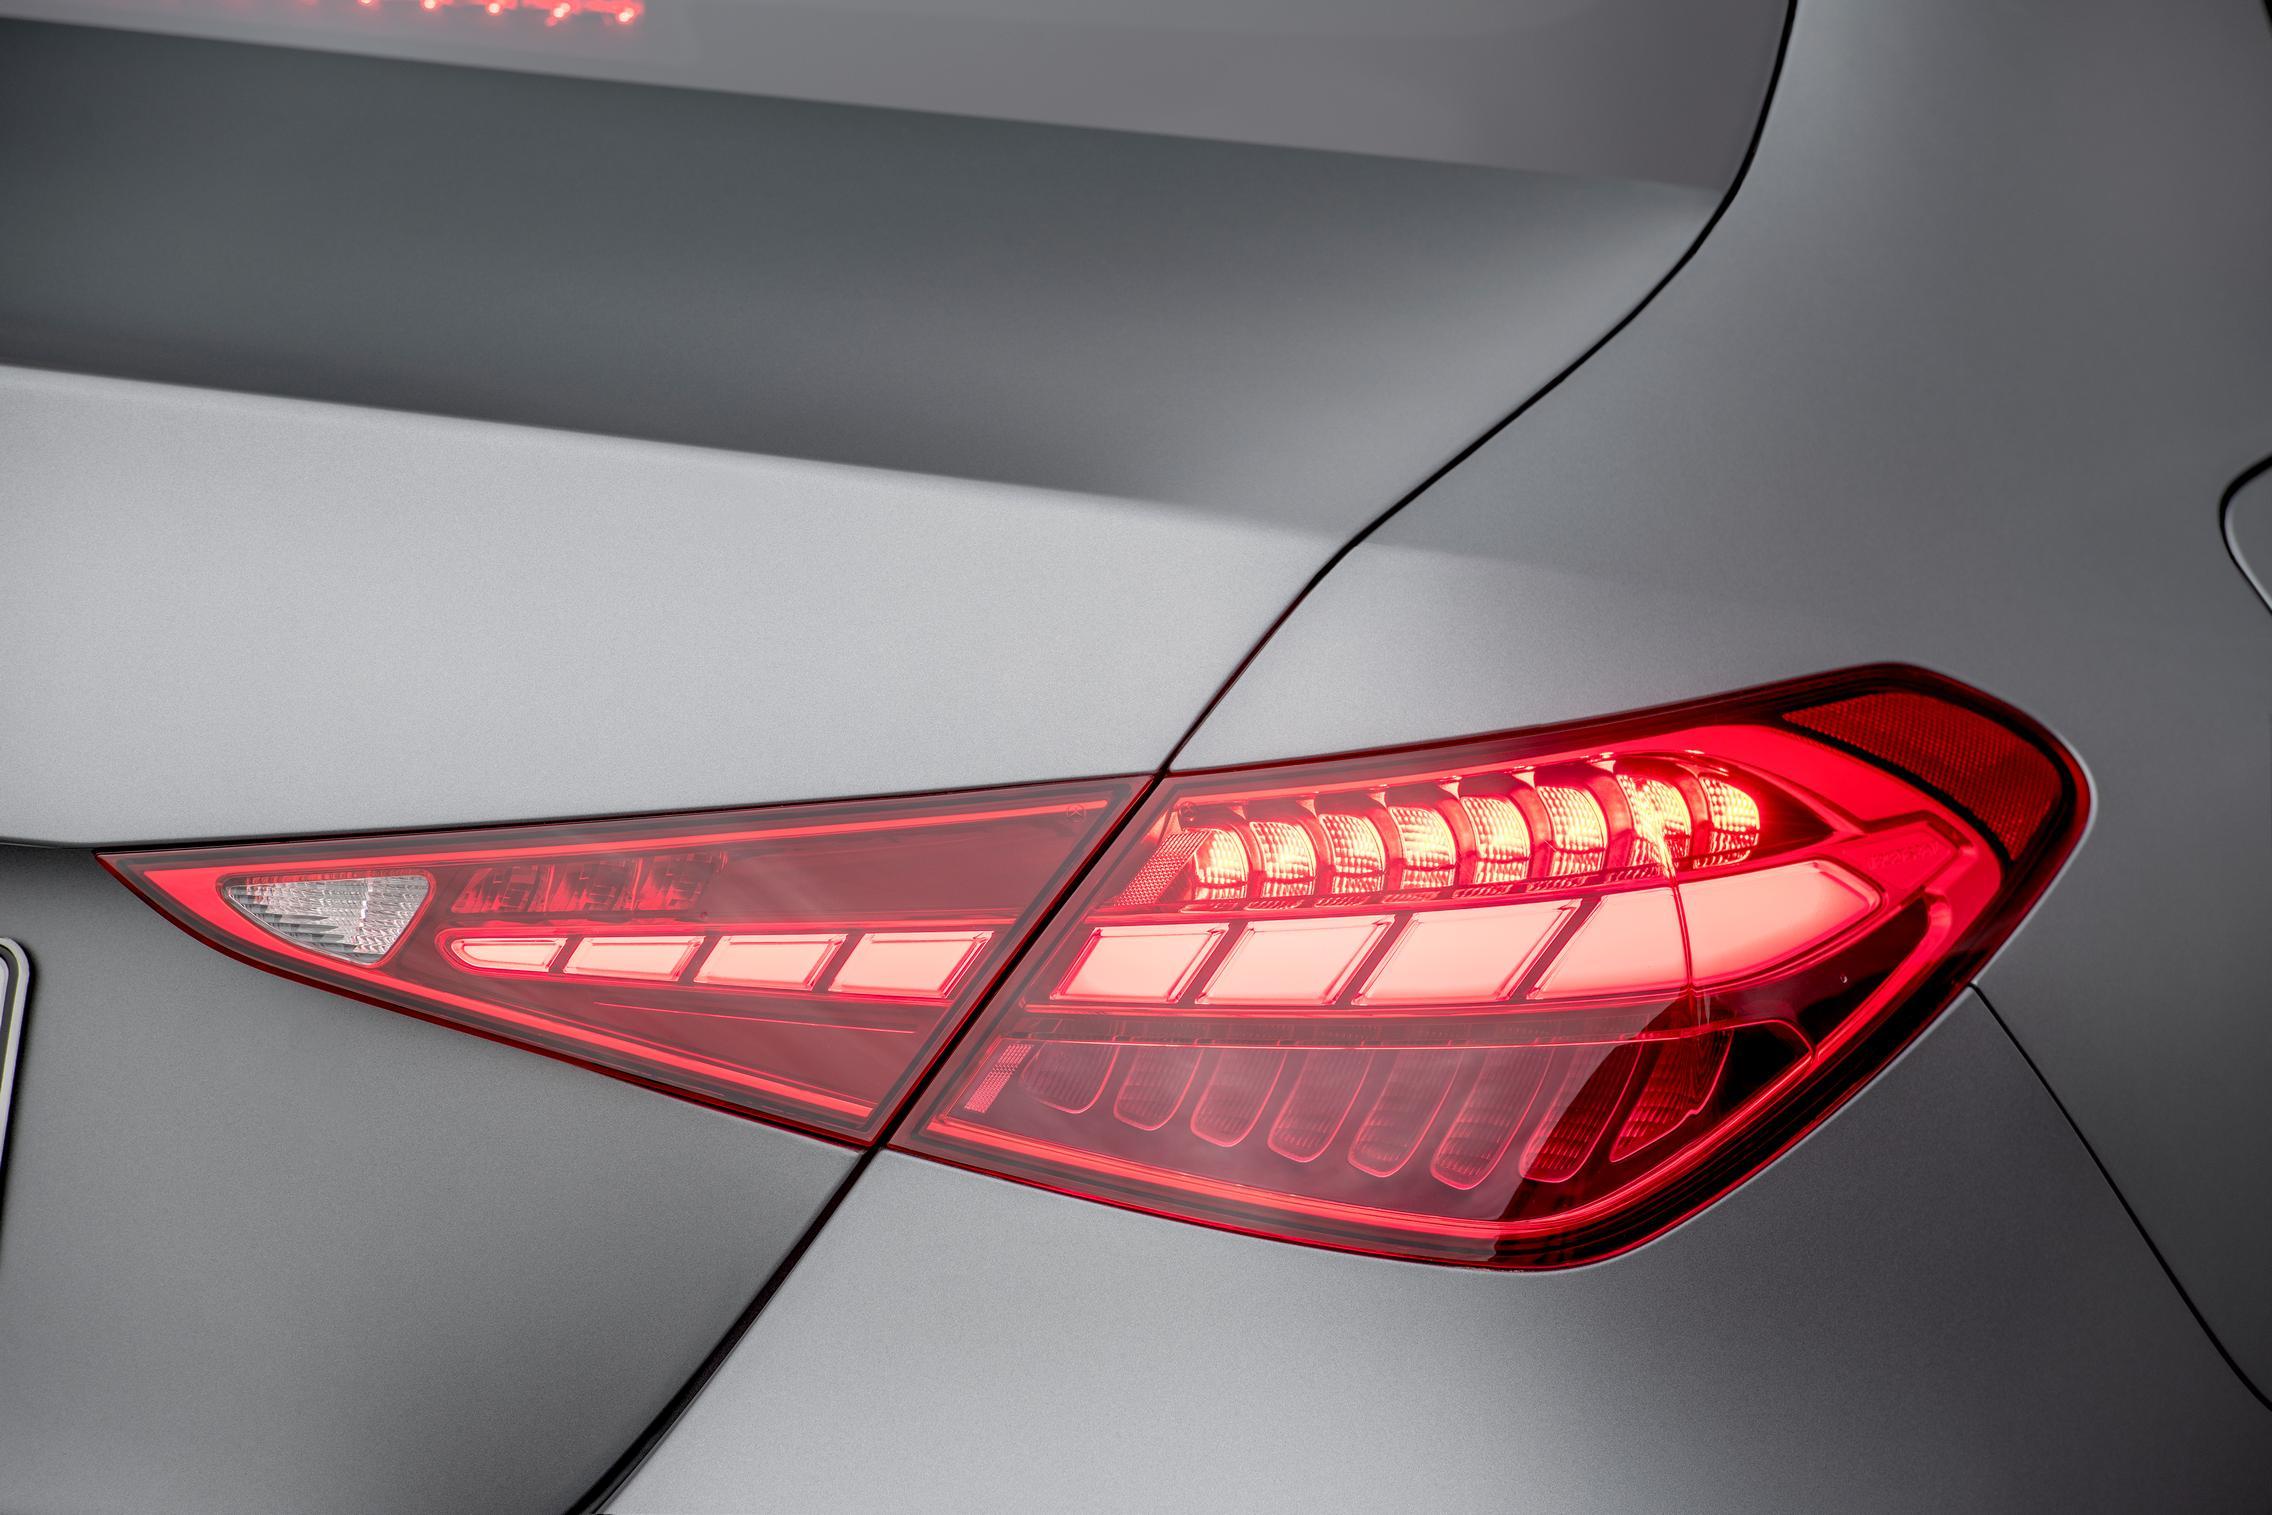 New-W206-C-Class-rear-light